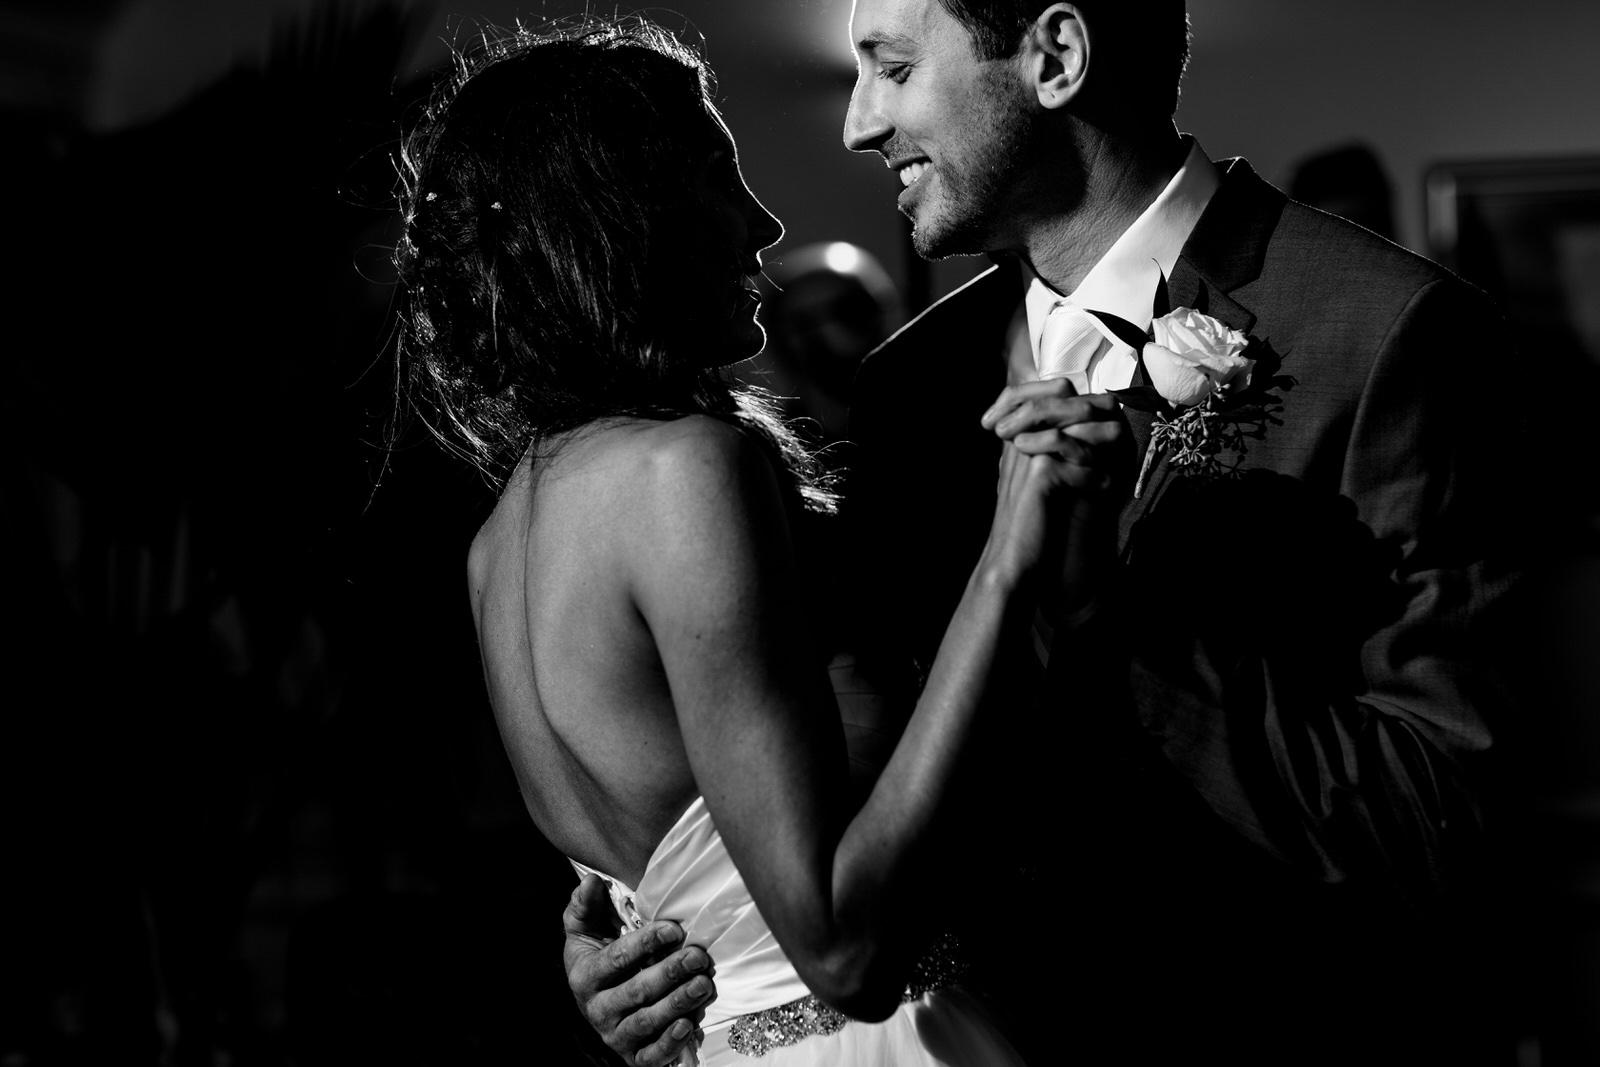 bride-groom-first-dance-jensen-beach-wedding-photographer-tiny-house-photo